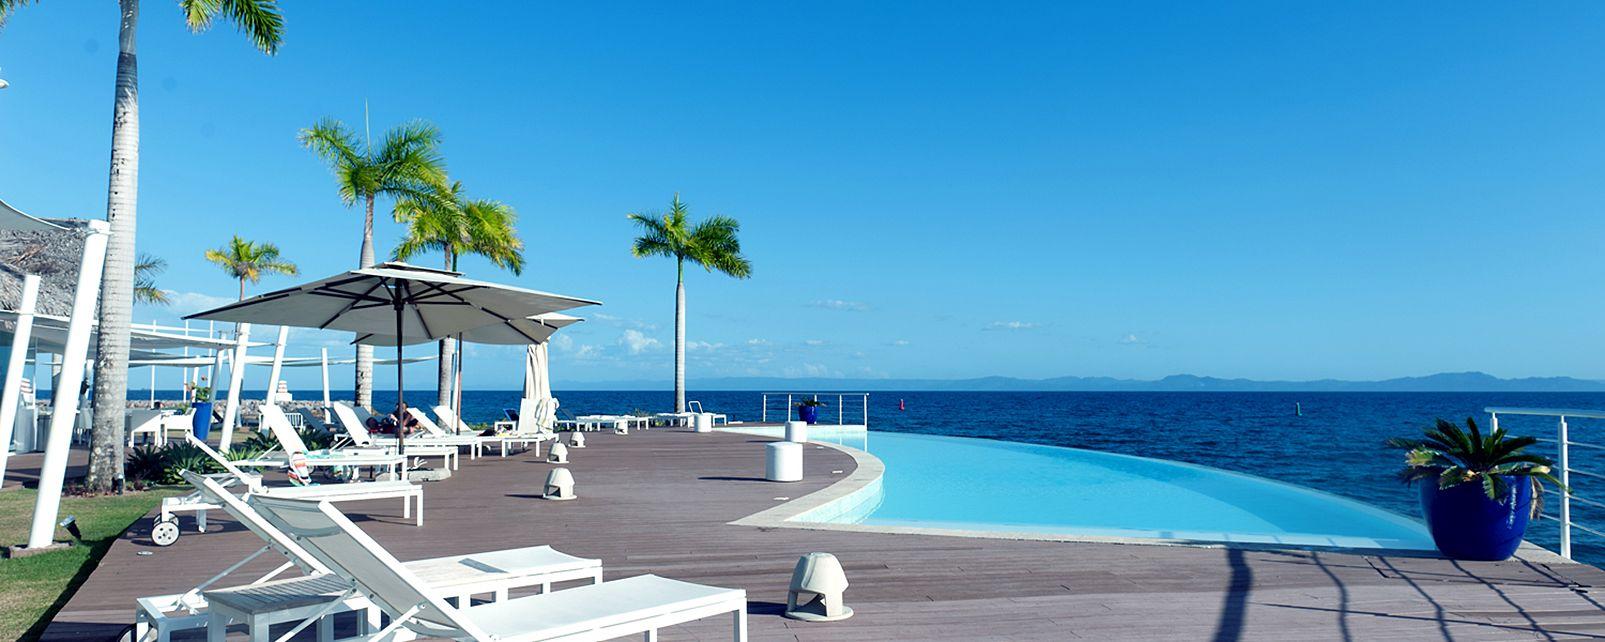 Hôtel The Bannister Hotel Yacht Club